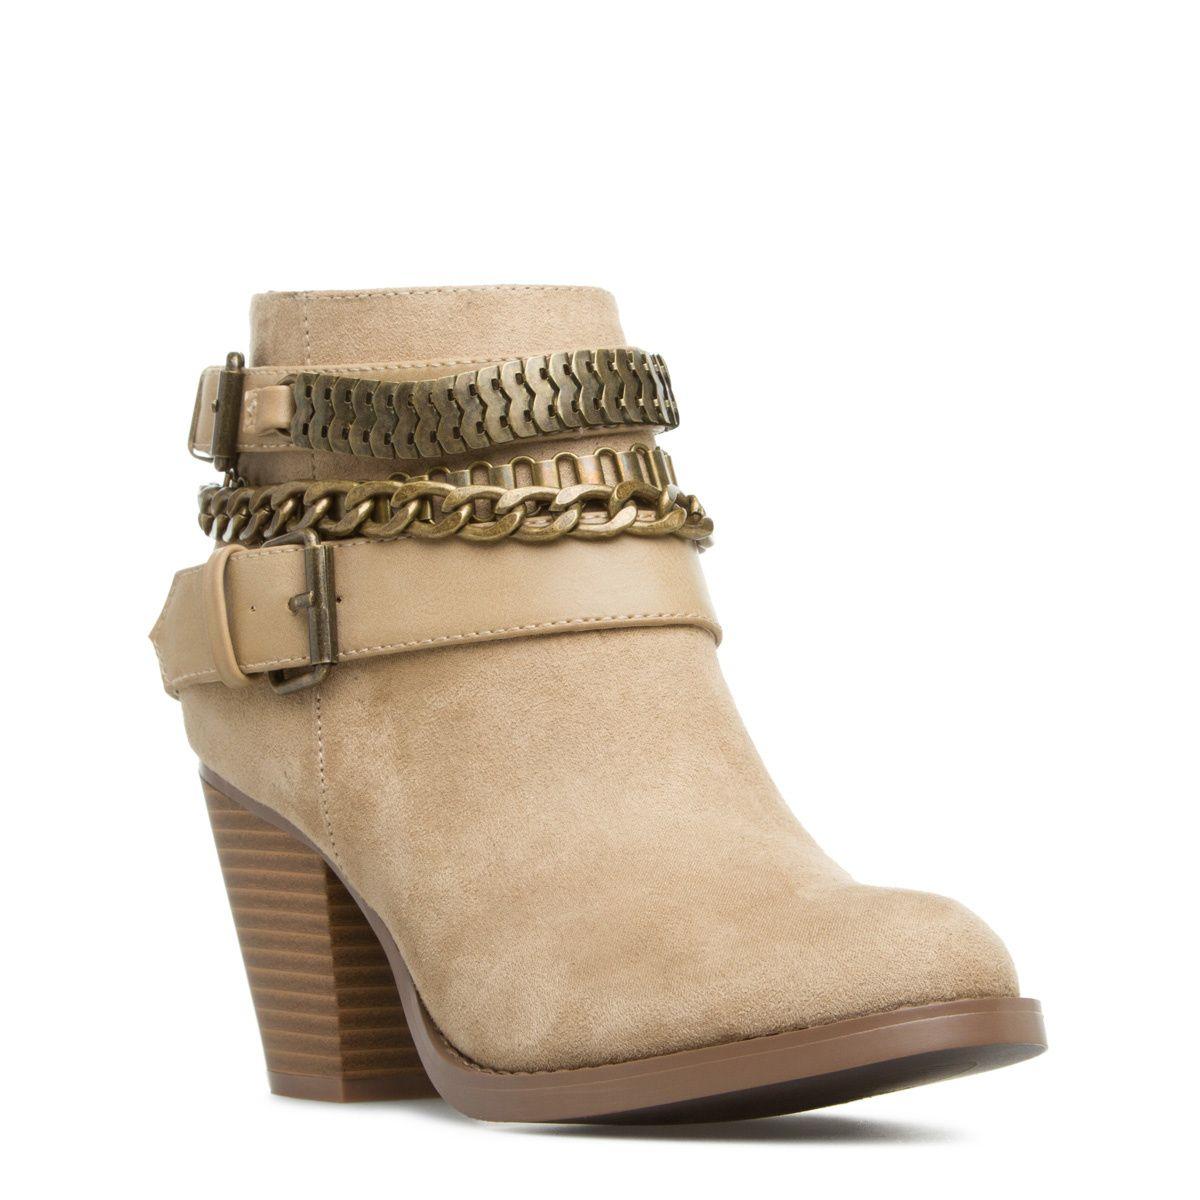 Brodie - ShoeDazzle